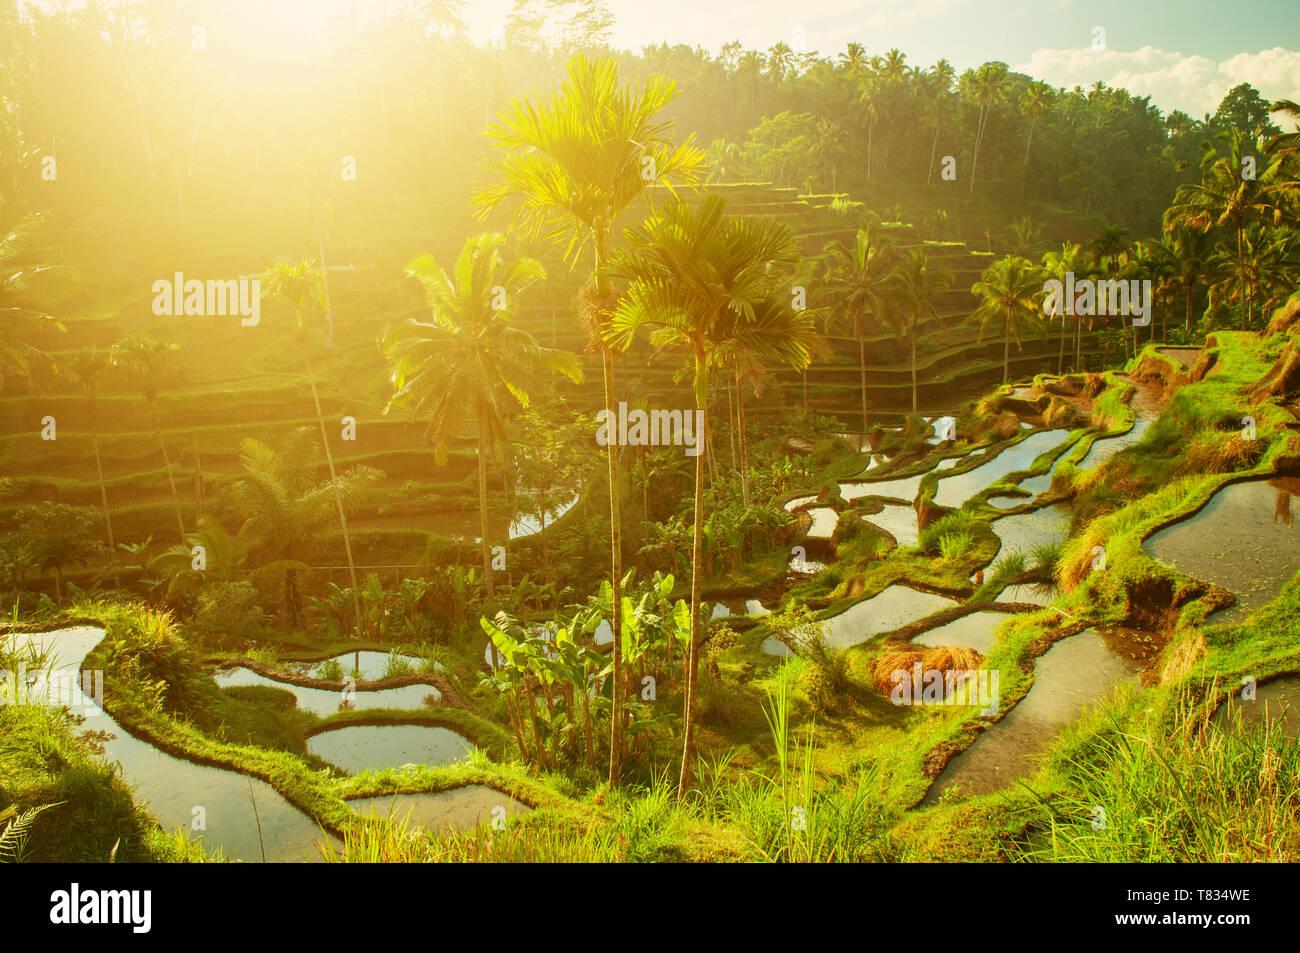 Terrace paddy rice fields in morning sunrise, Ubud, Bali, Indonesia - Stock Image